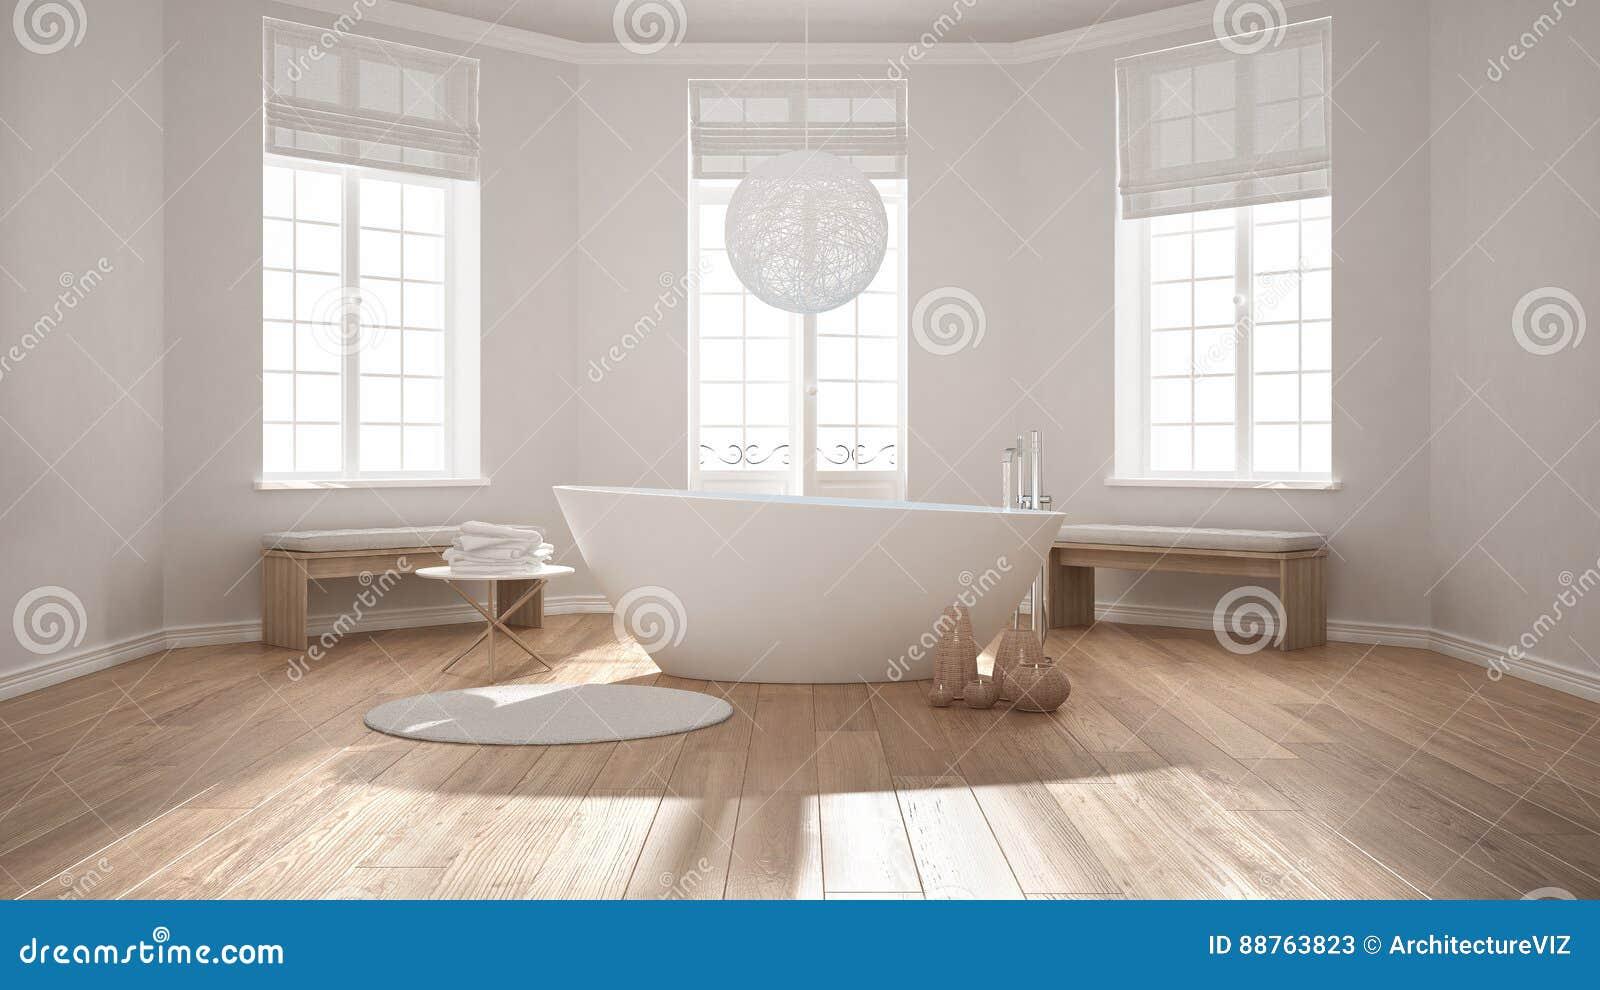 Zen Classic Spa Bathroom With Bathtub, Minimalist Scandinavian I ...